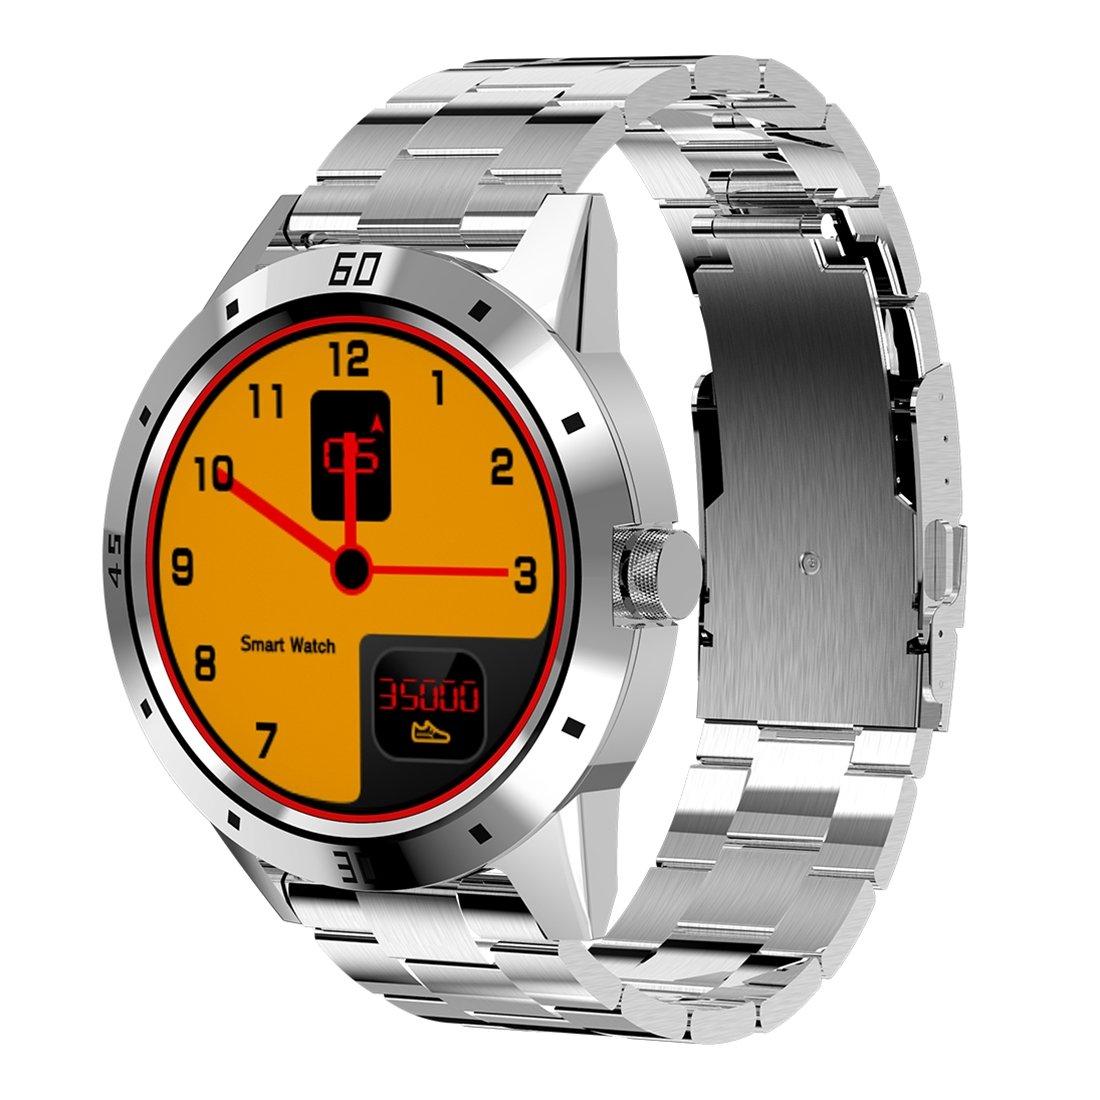 Reloj Inteligente de Moda N6 Smart Watch 1.3 Pulgadas TFT ...